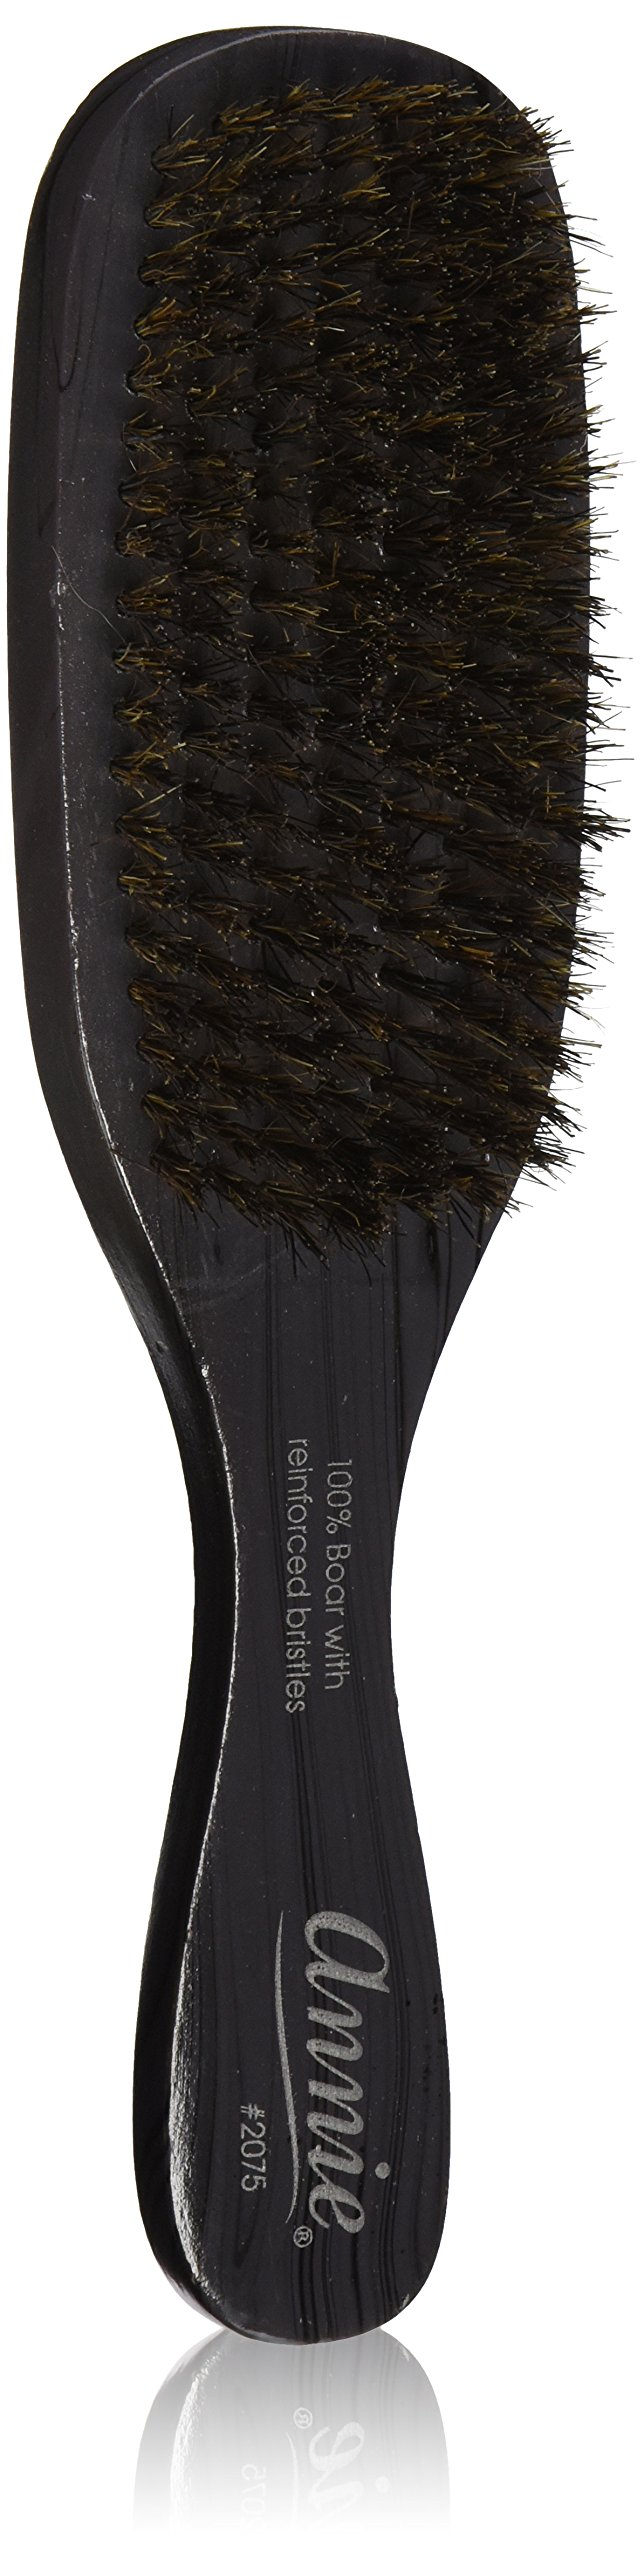 Annie Professional Wave Brush 100% Natural Boar Medium Bristle